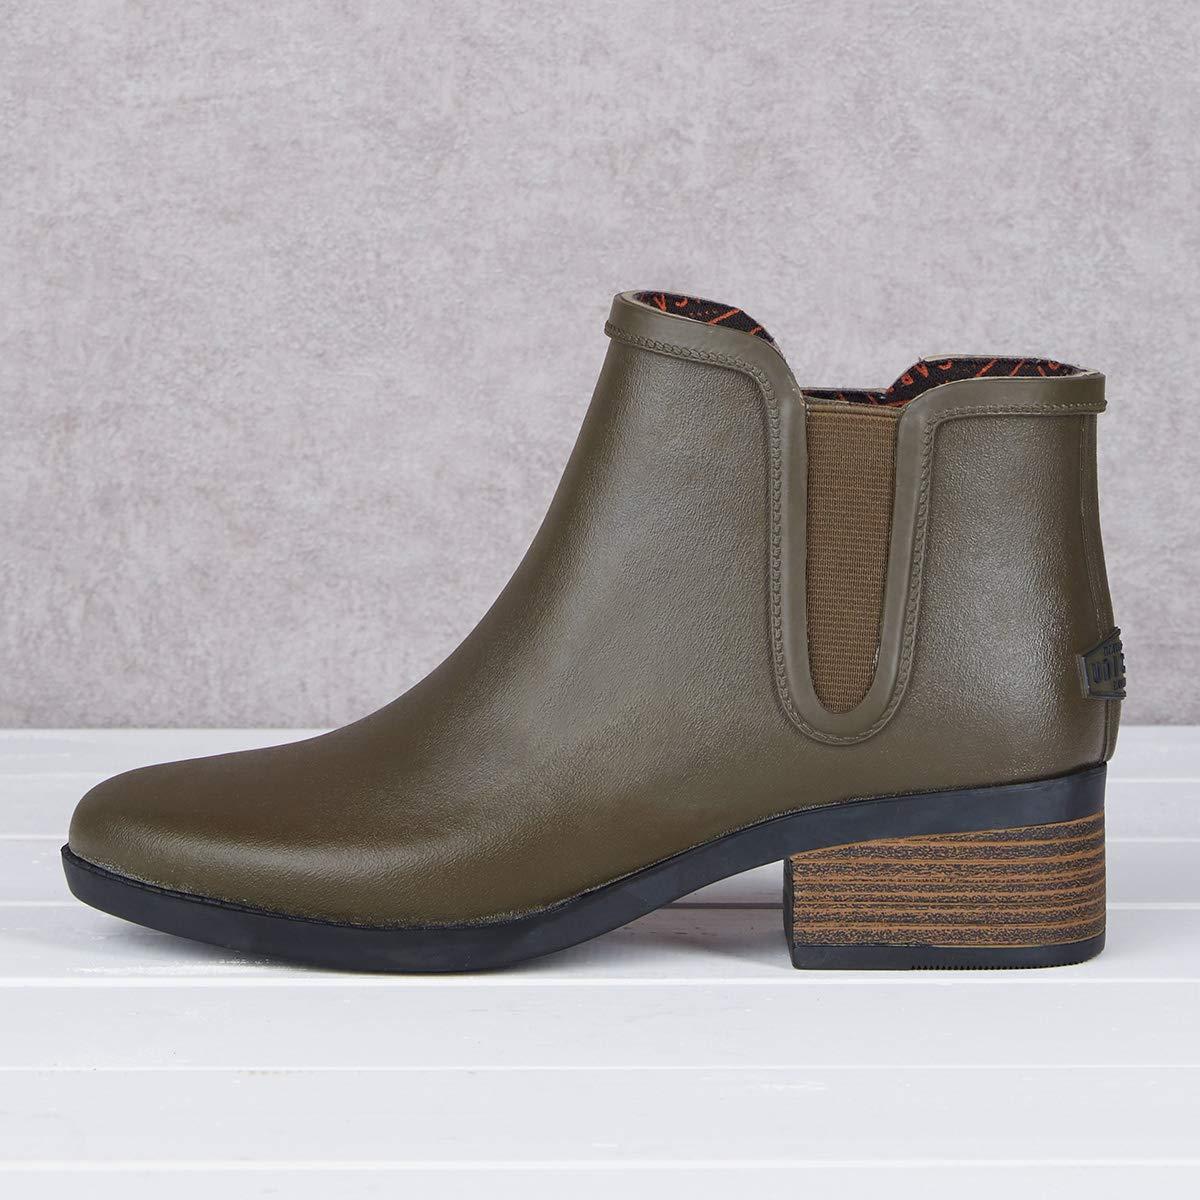 UNICARE Womens Chelsea Rain Boots Waterproof Slip on Shoes Nonslip Short Ankel Boots Rubber Rain Footwear Handmade